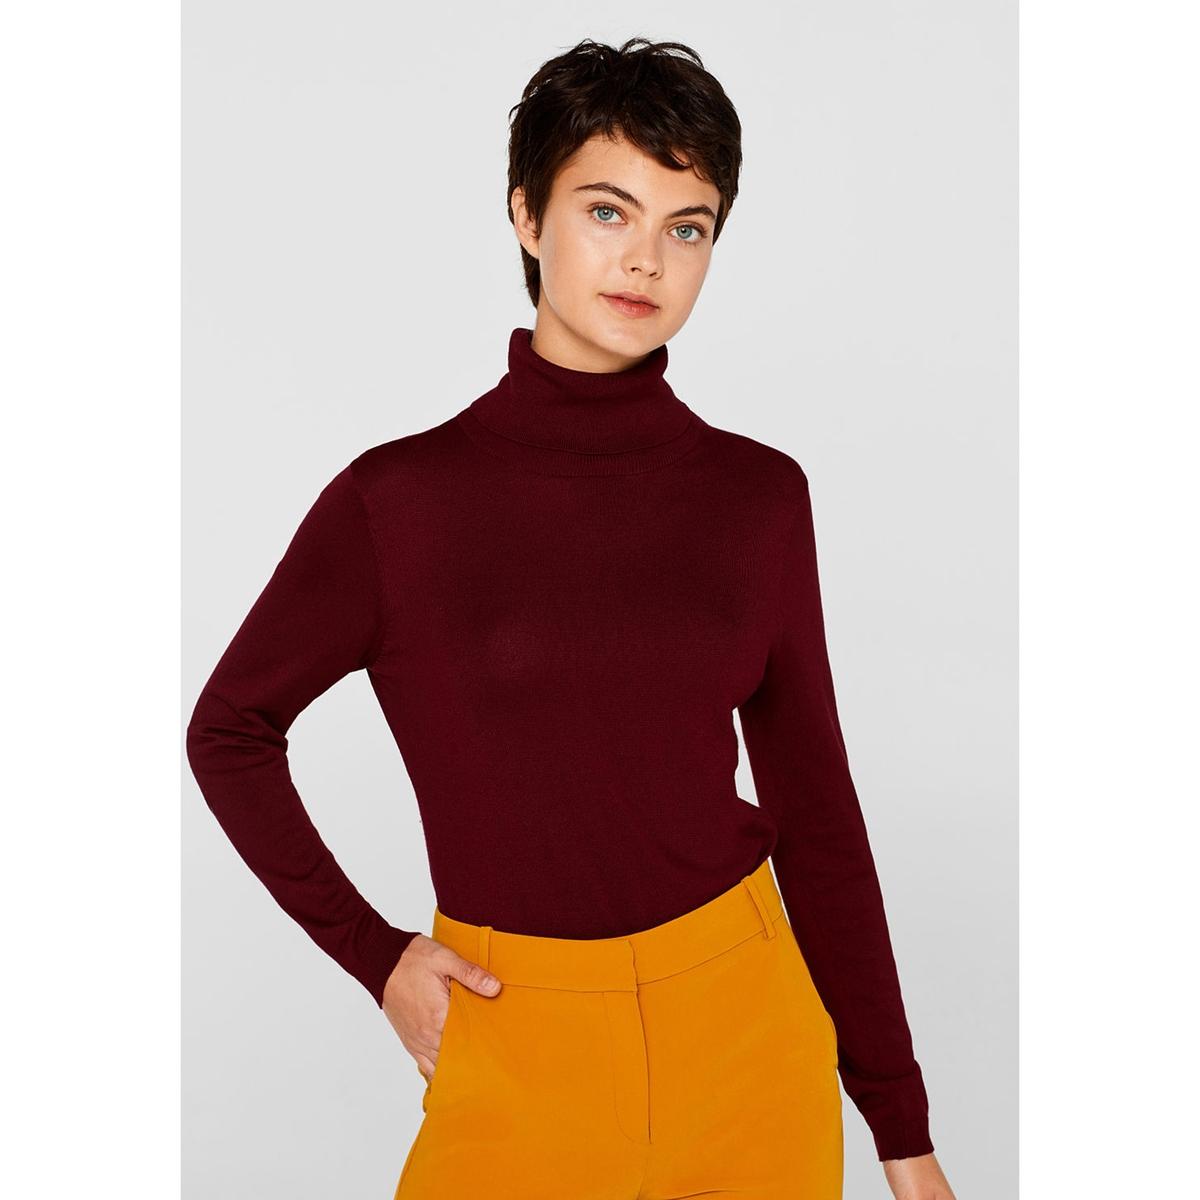 Jersey con cuello vuelto, manga larga